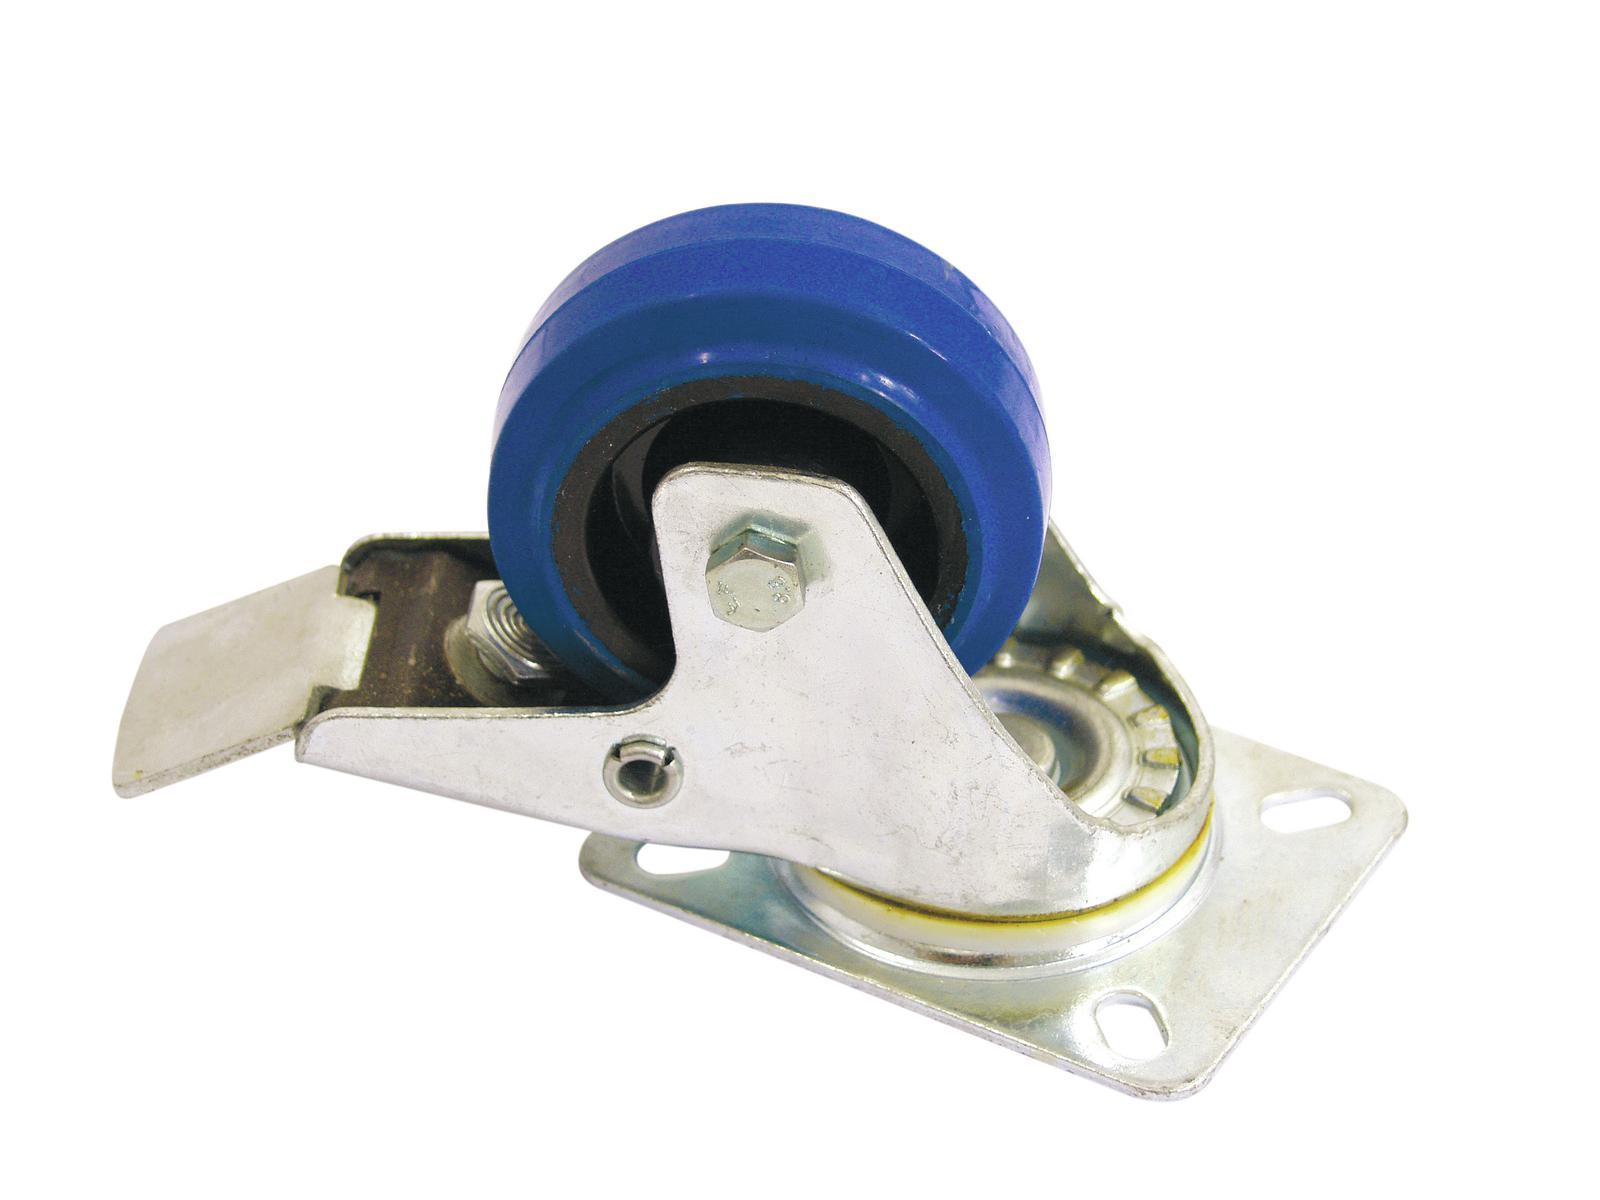 ROADINGER Lenkrolle 80mm blau mit Bremse